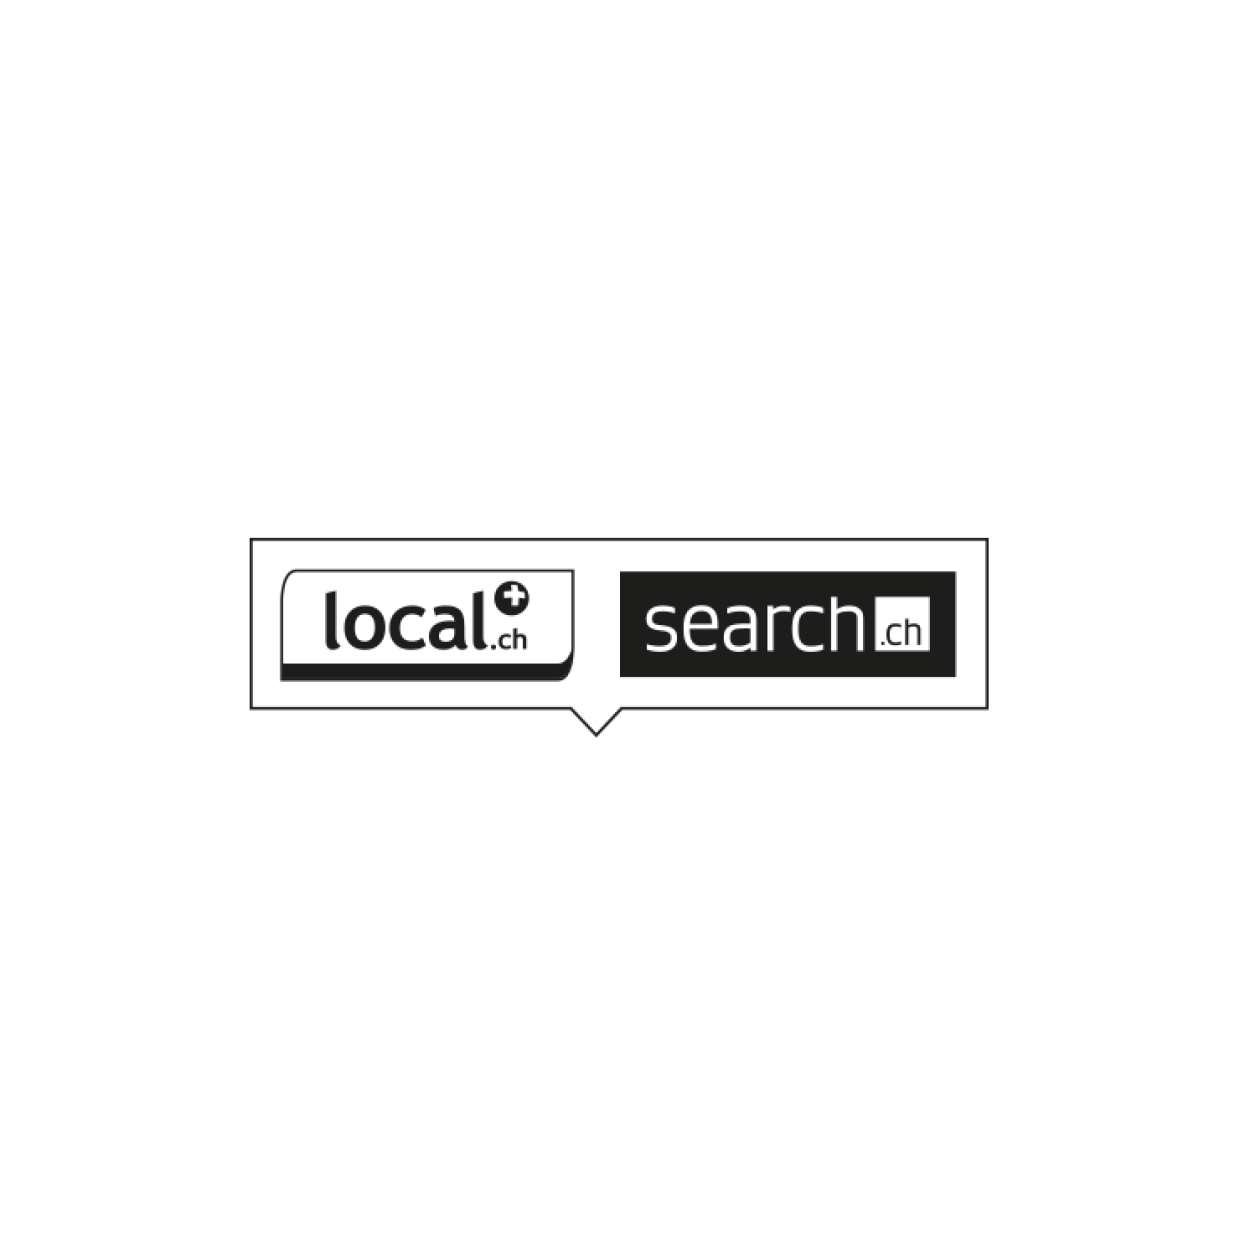 thumb_local_Search.jpg